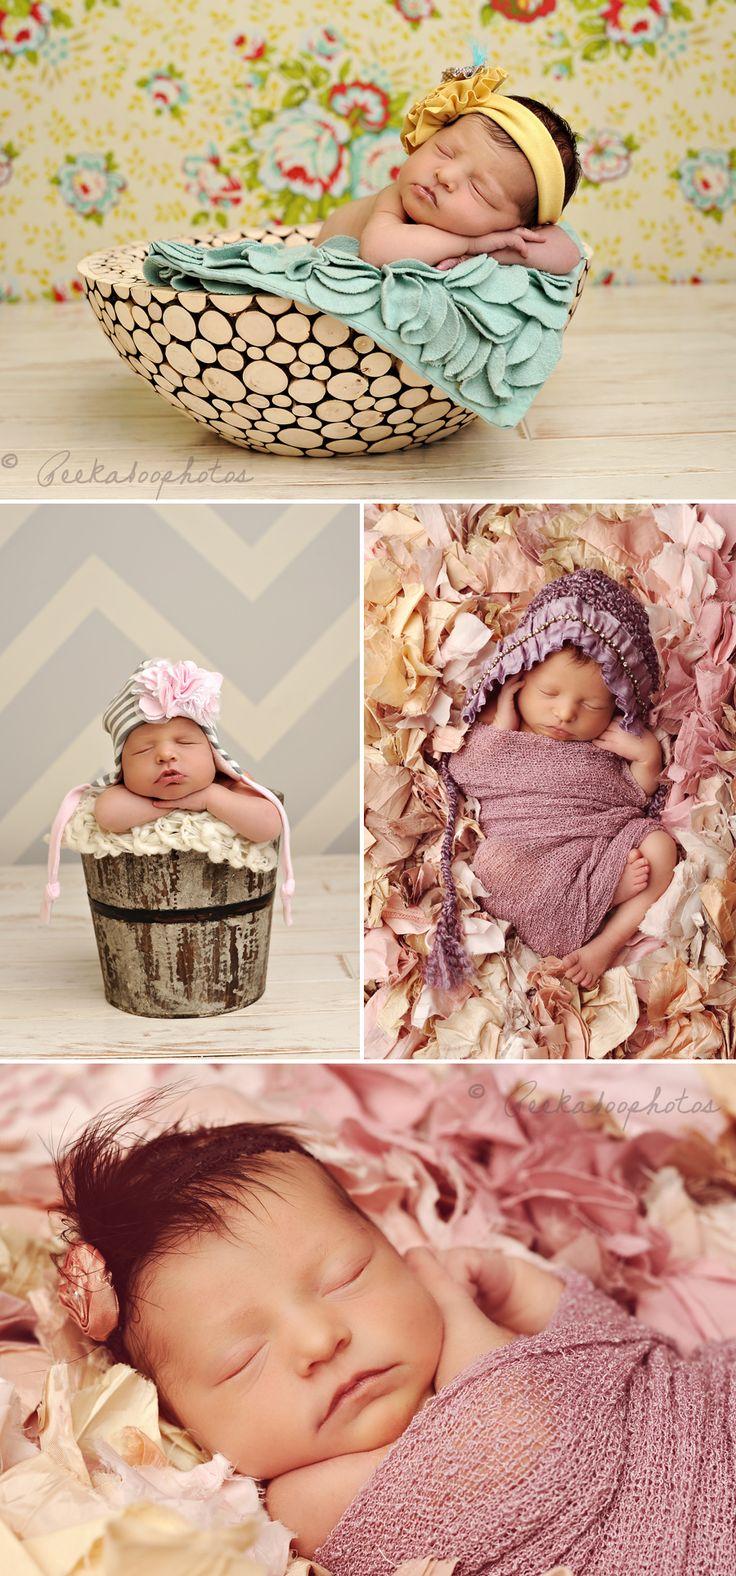 : Photos Ideas, Newborns Photos, Newborns Pictures, Newborns Girls, Girls Photos, Newborns Pics, Baby Girls, Baby Photography, Baby Photos